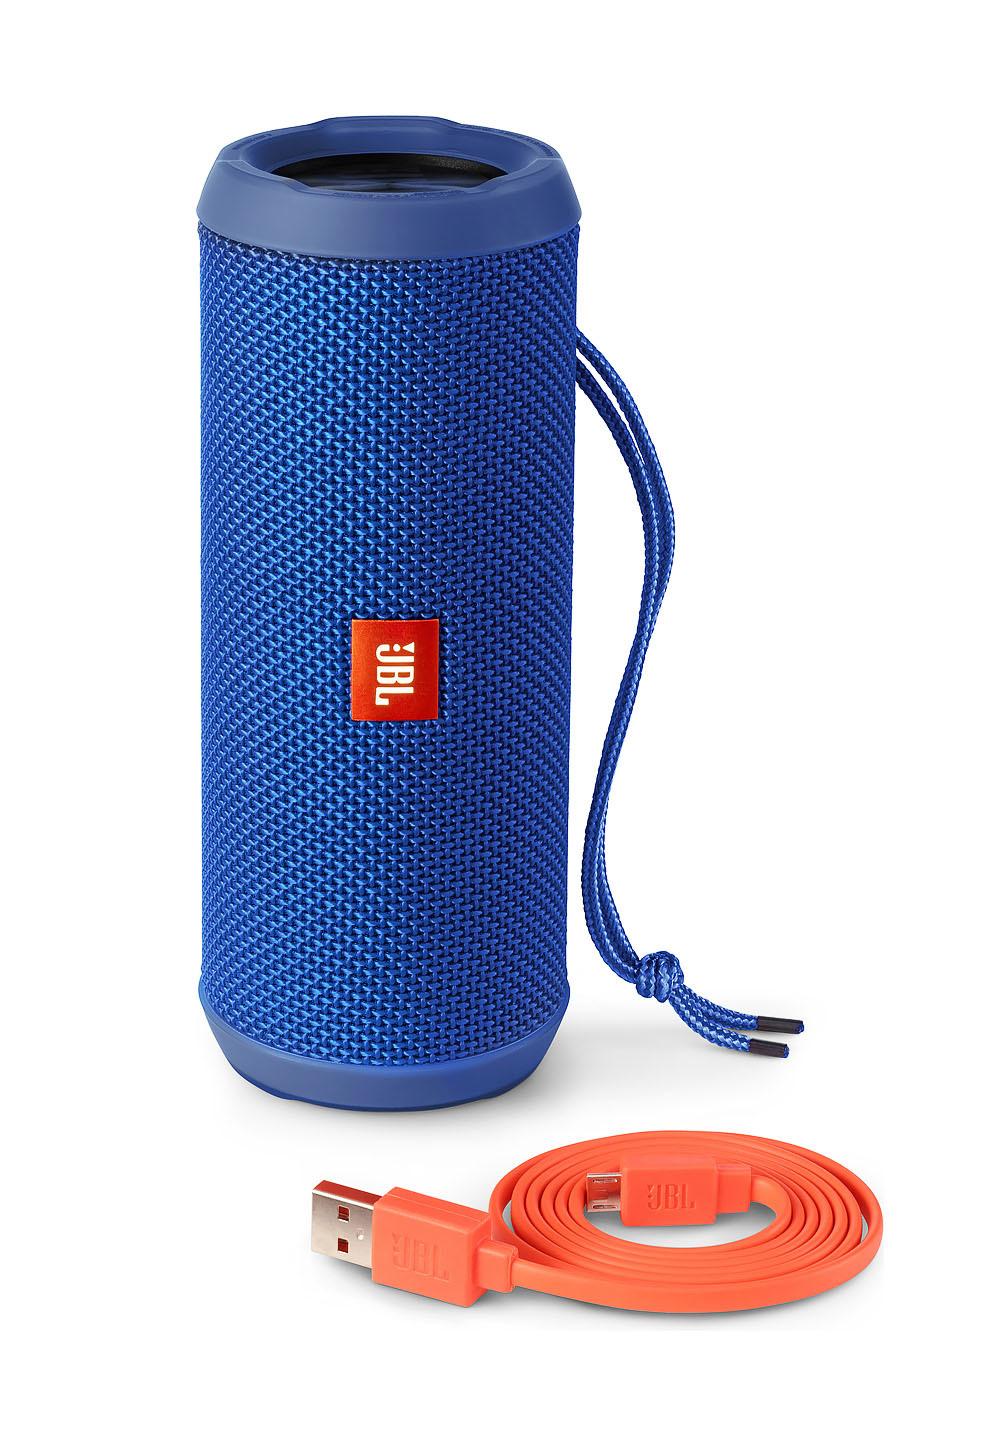 (Brands4Friends) JBL Flip 3 in Blau inkl. Füllartikel für 67,88 €